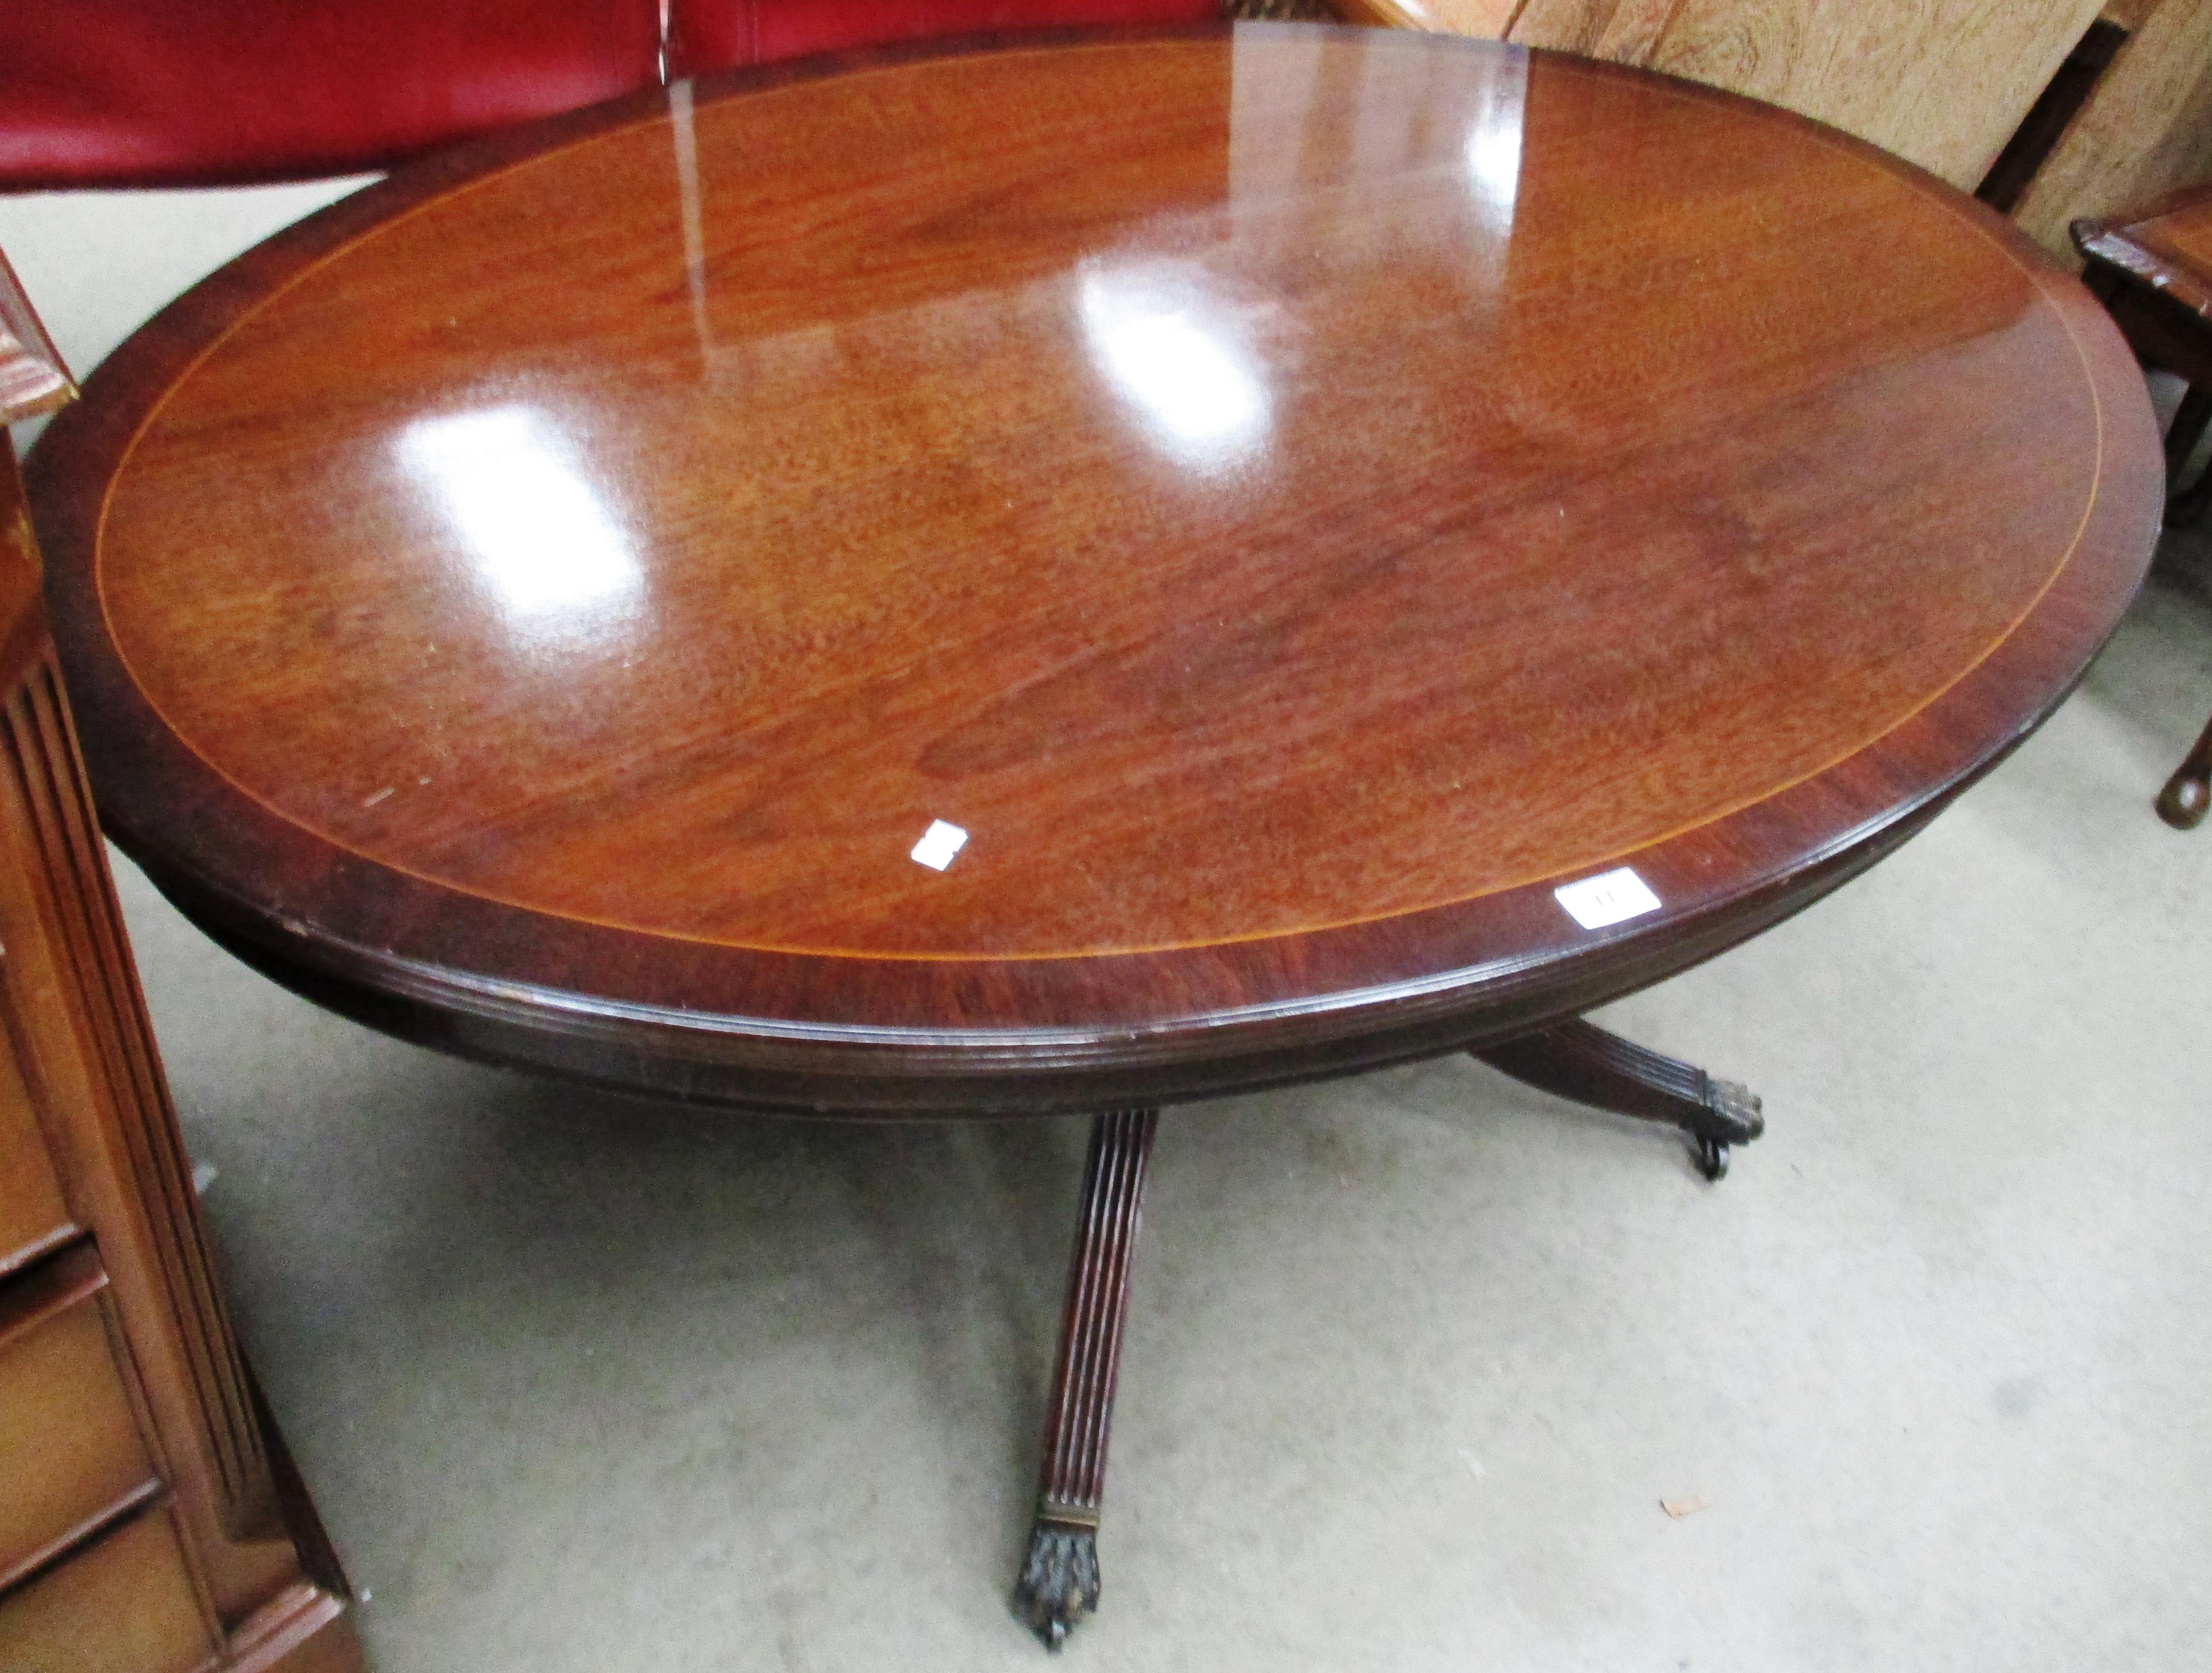 Lot 11 - A mahogany oval coffee table 120 x 77cm